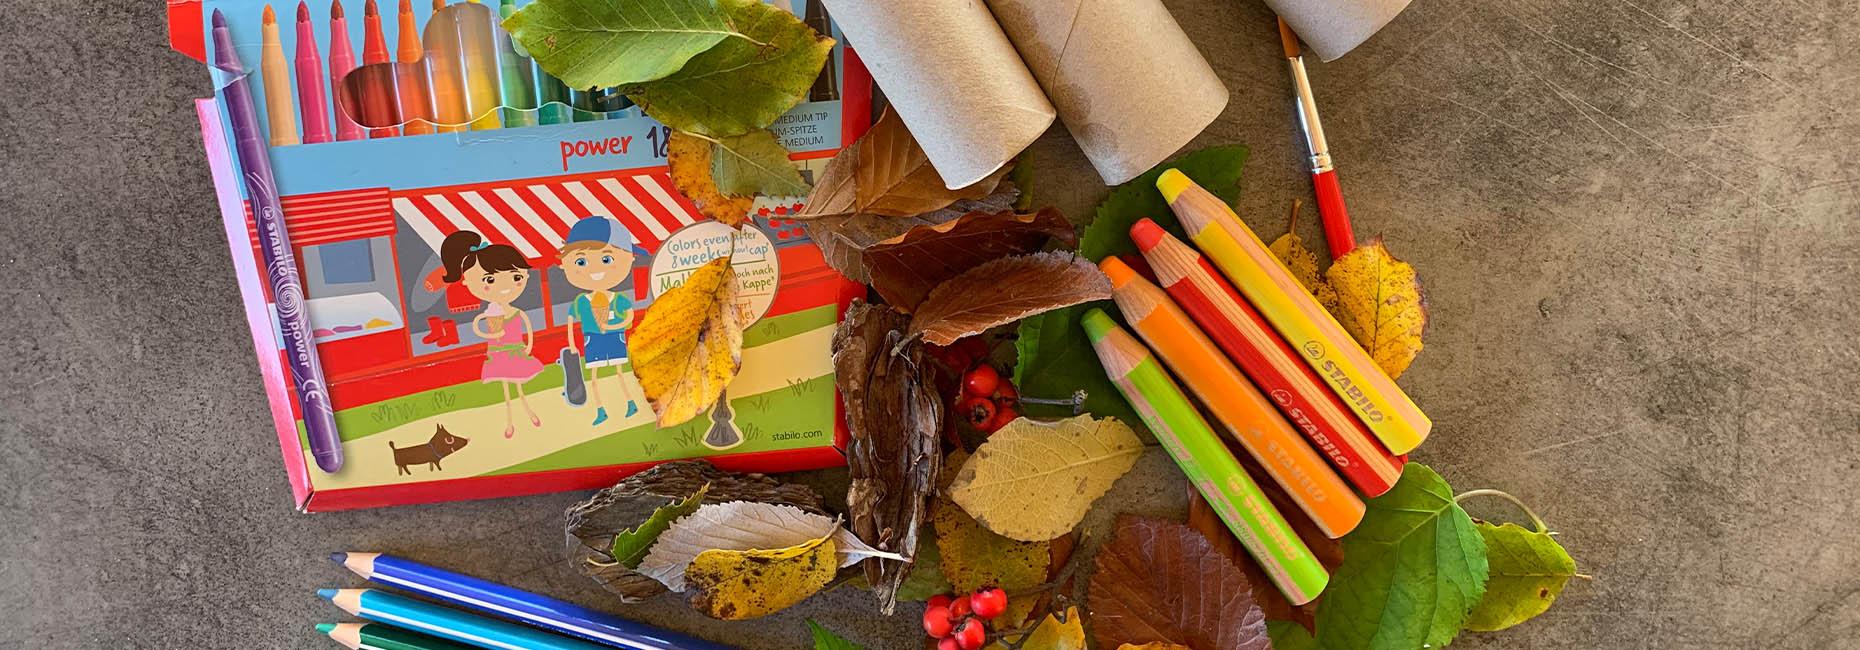 Atelier-feuilles-automne_banner-1860x650px.jpg